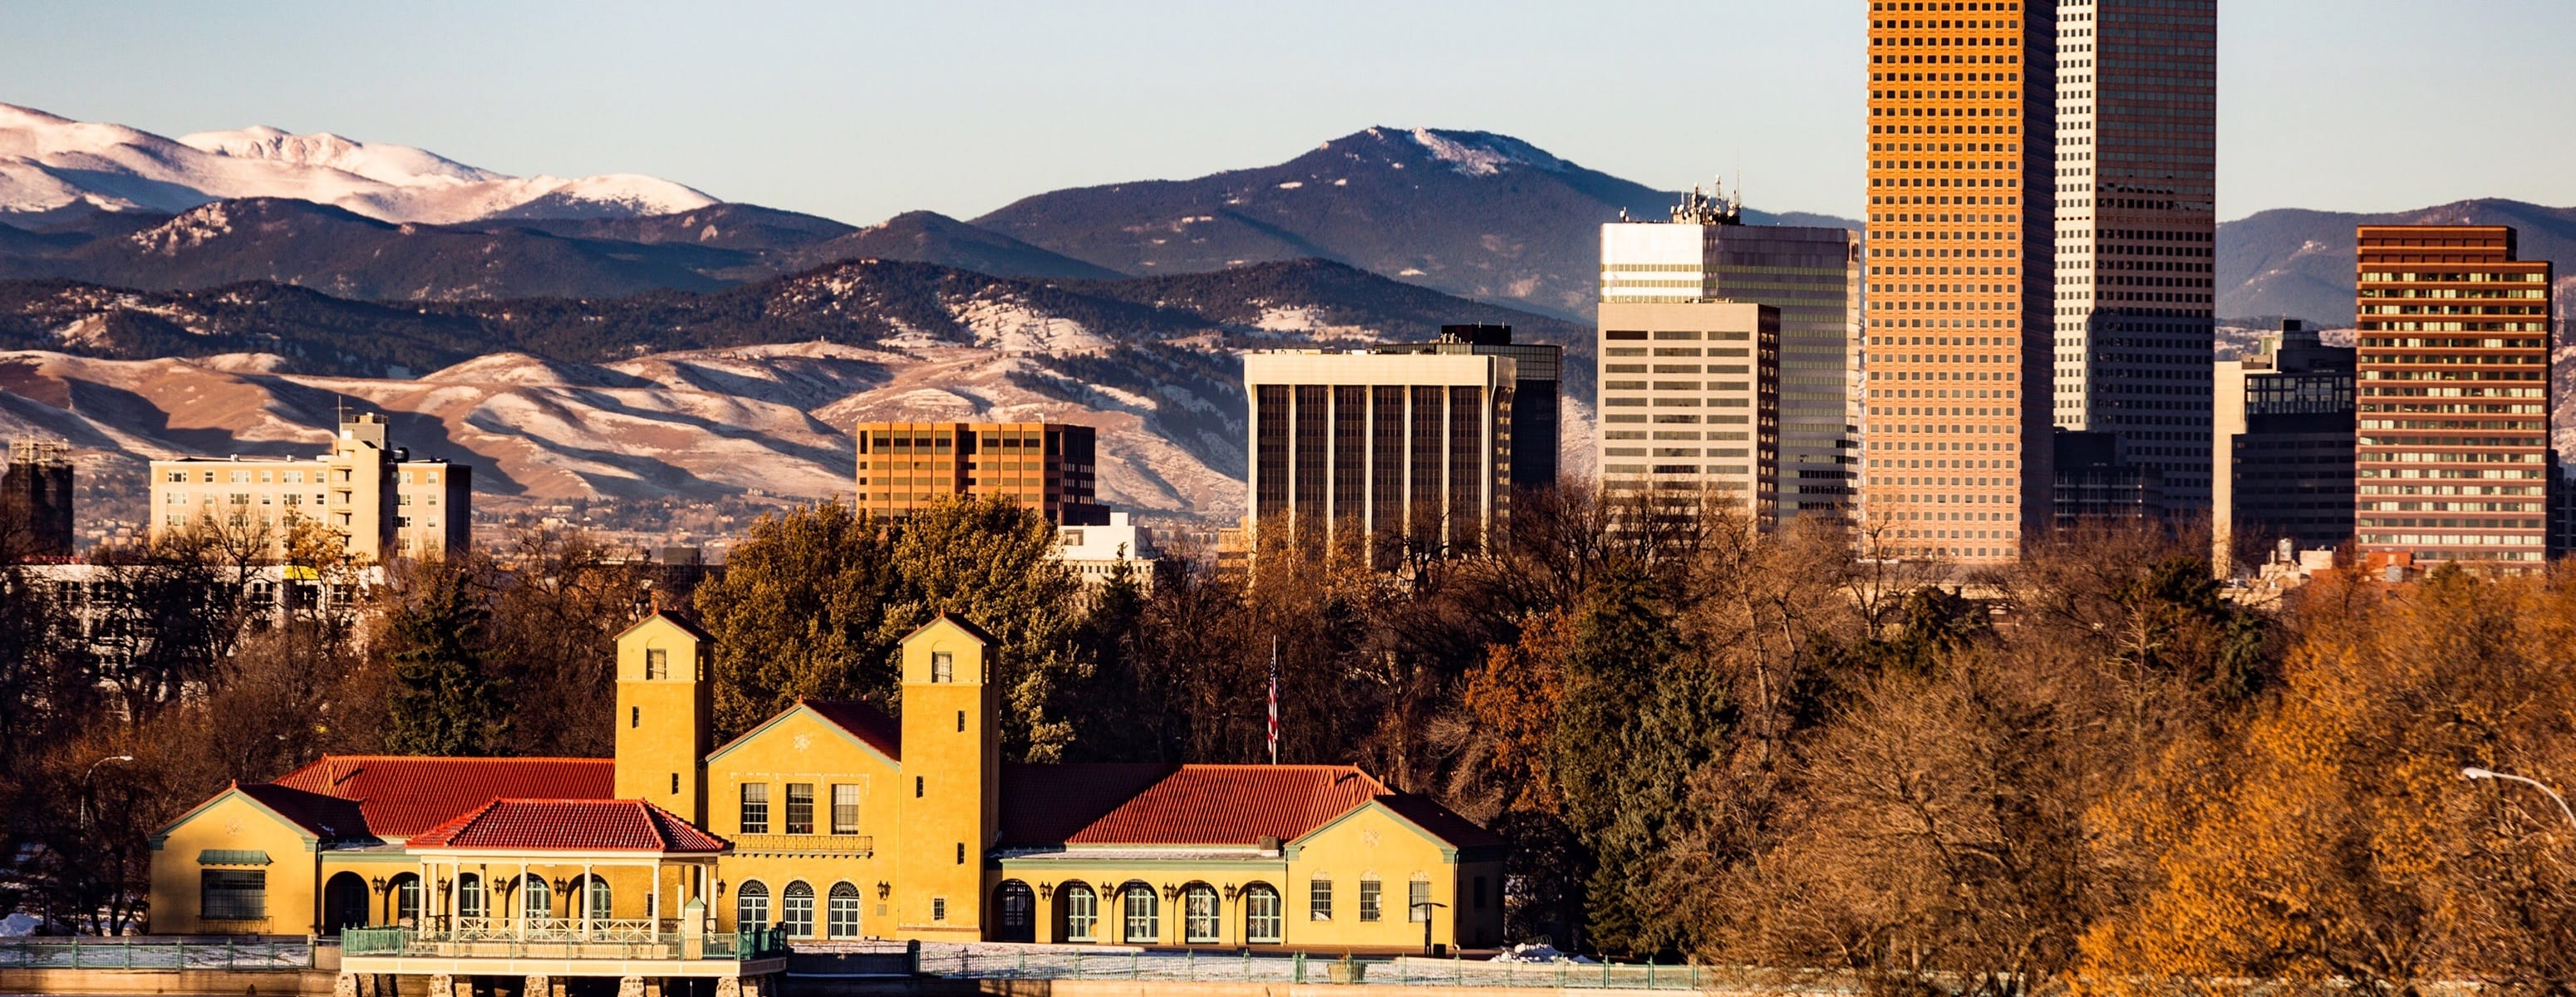 Denver 2018 with s Denver Vacation Rentals & Cabin Rentals Airbnb Colorado United States cabins in denver colorado & camper rental denver